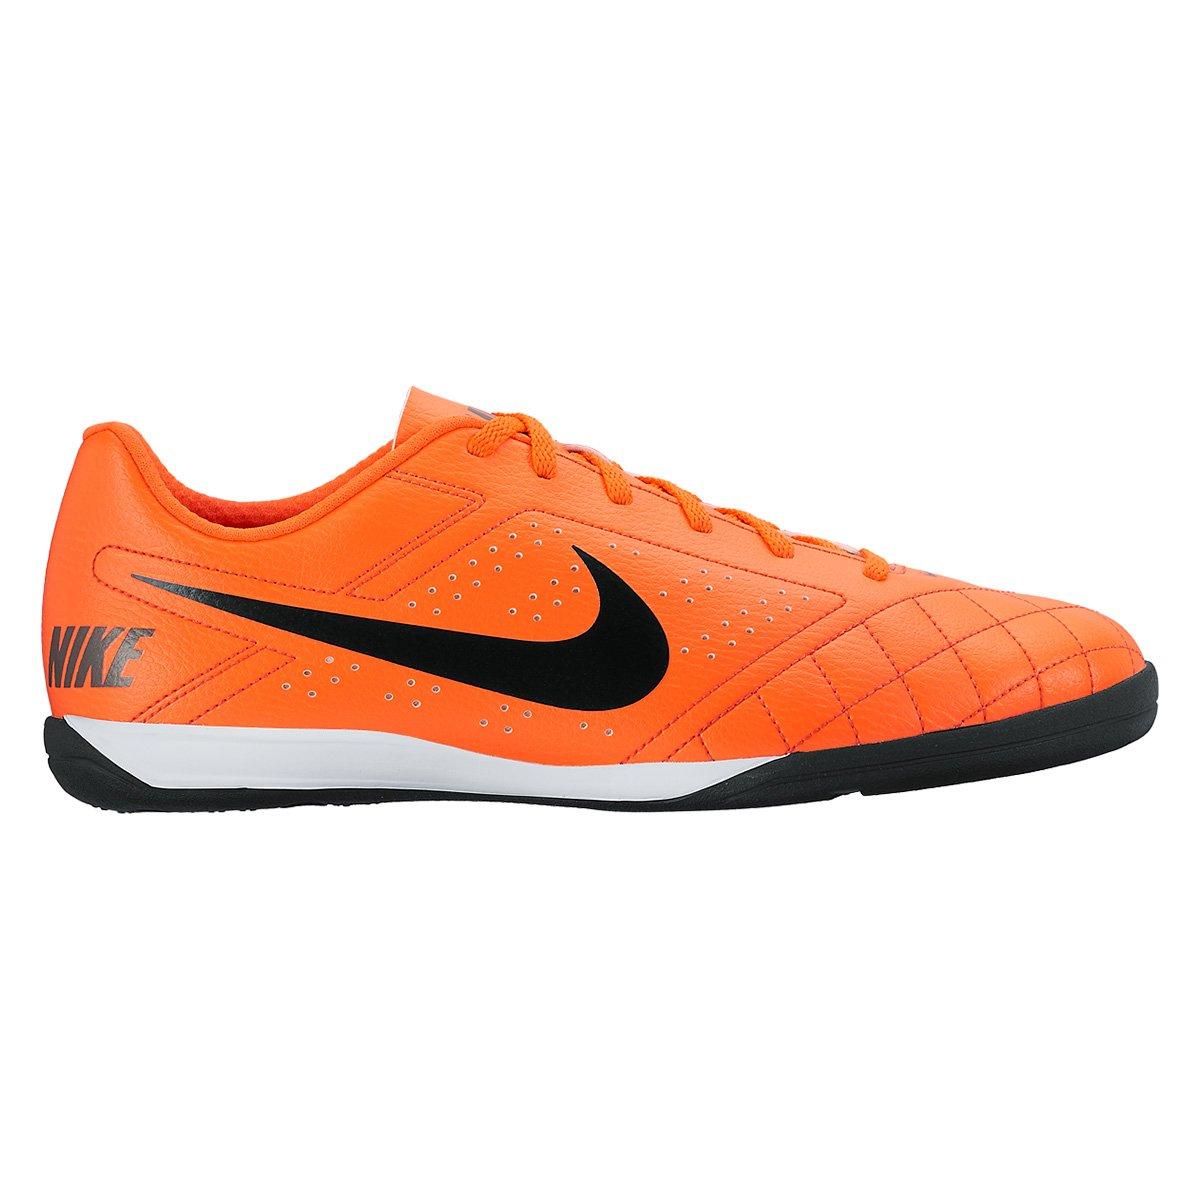 f3e94acb41 Chuteira Futsal Nike Beco 2 Futsal - Laranja - Compre Agora